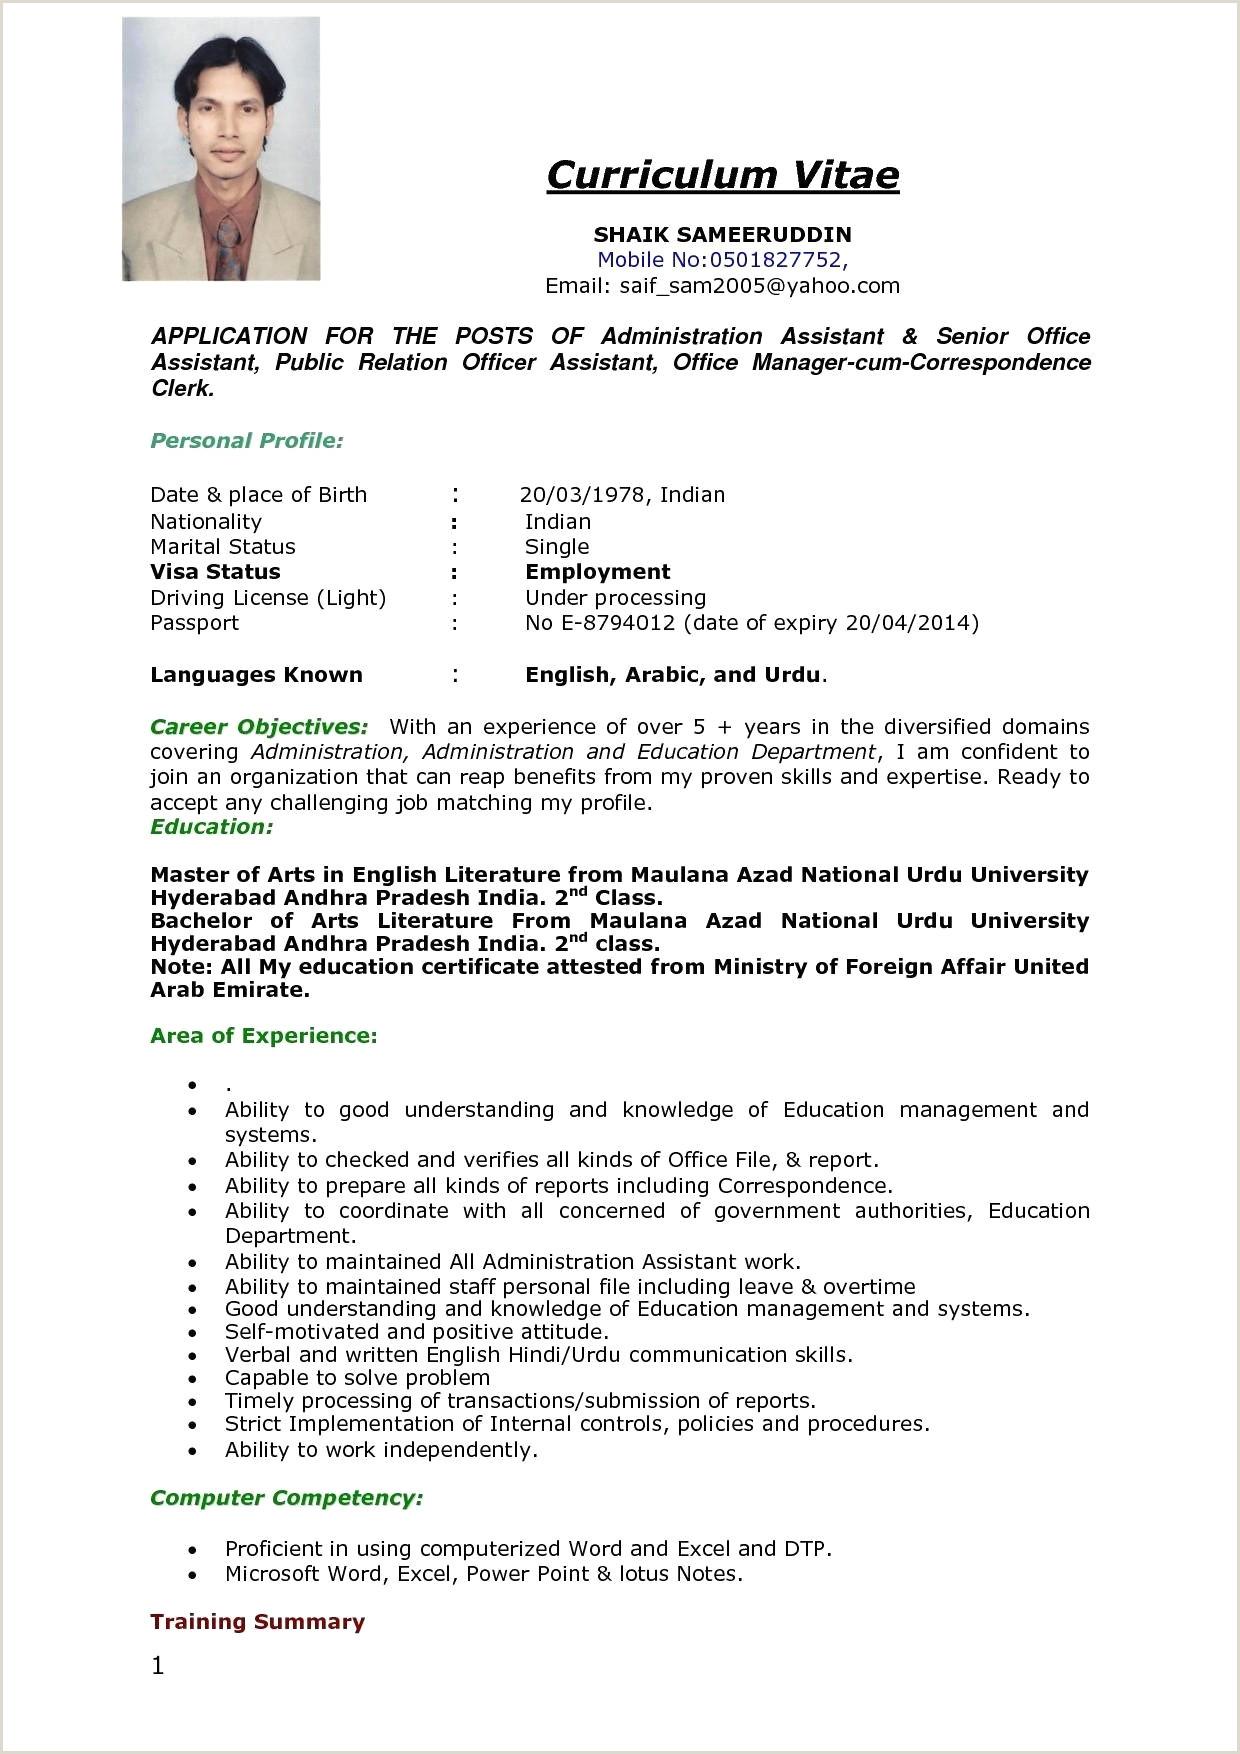 Modelos De Curriculum Vitae Para Rellenar Simple Cv En Espanol Gratuit It Resumes Typist Resume Best How to